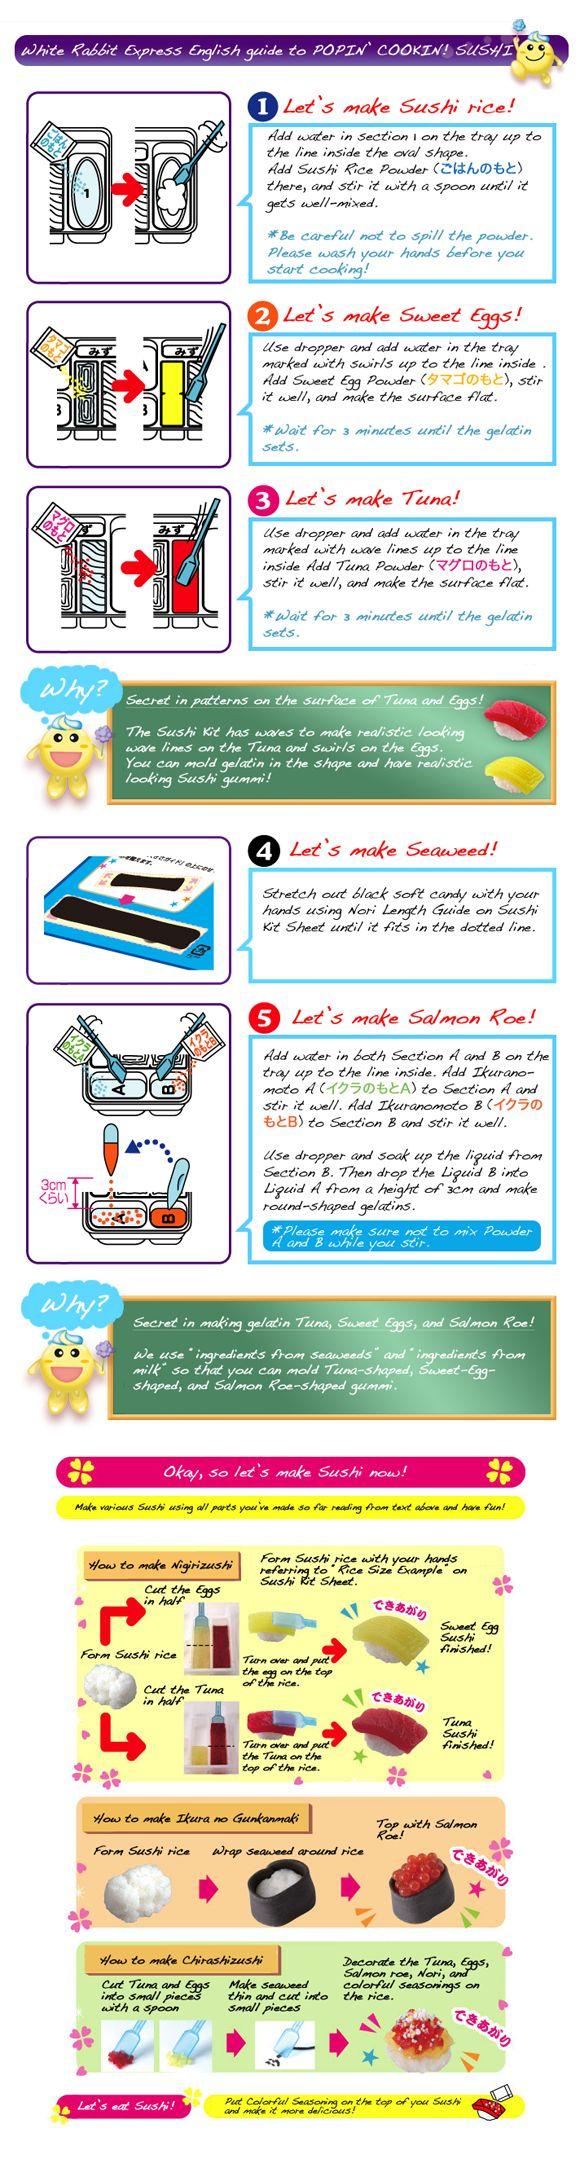 Popin' Cookin! Sushi Kit English Instructions